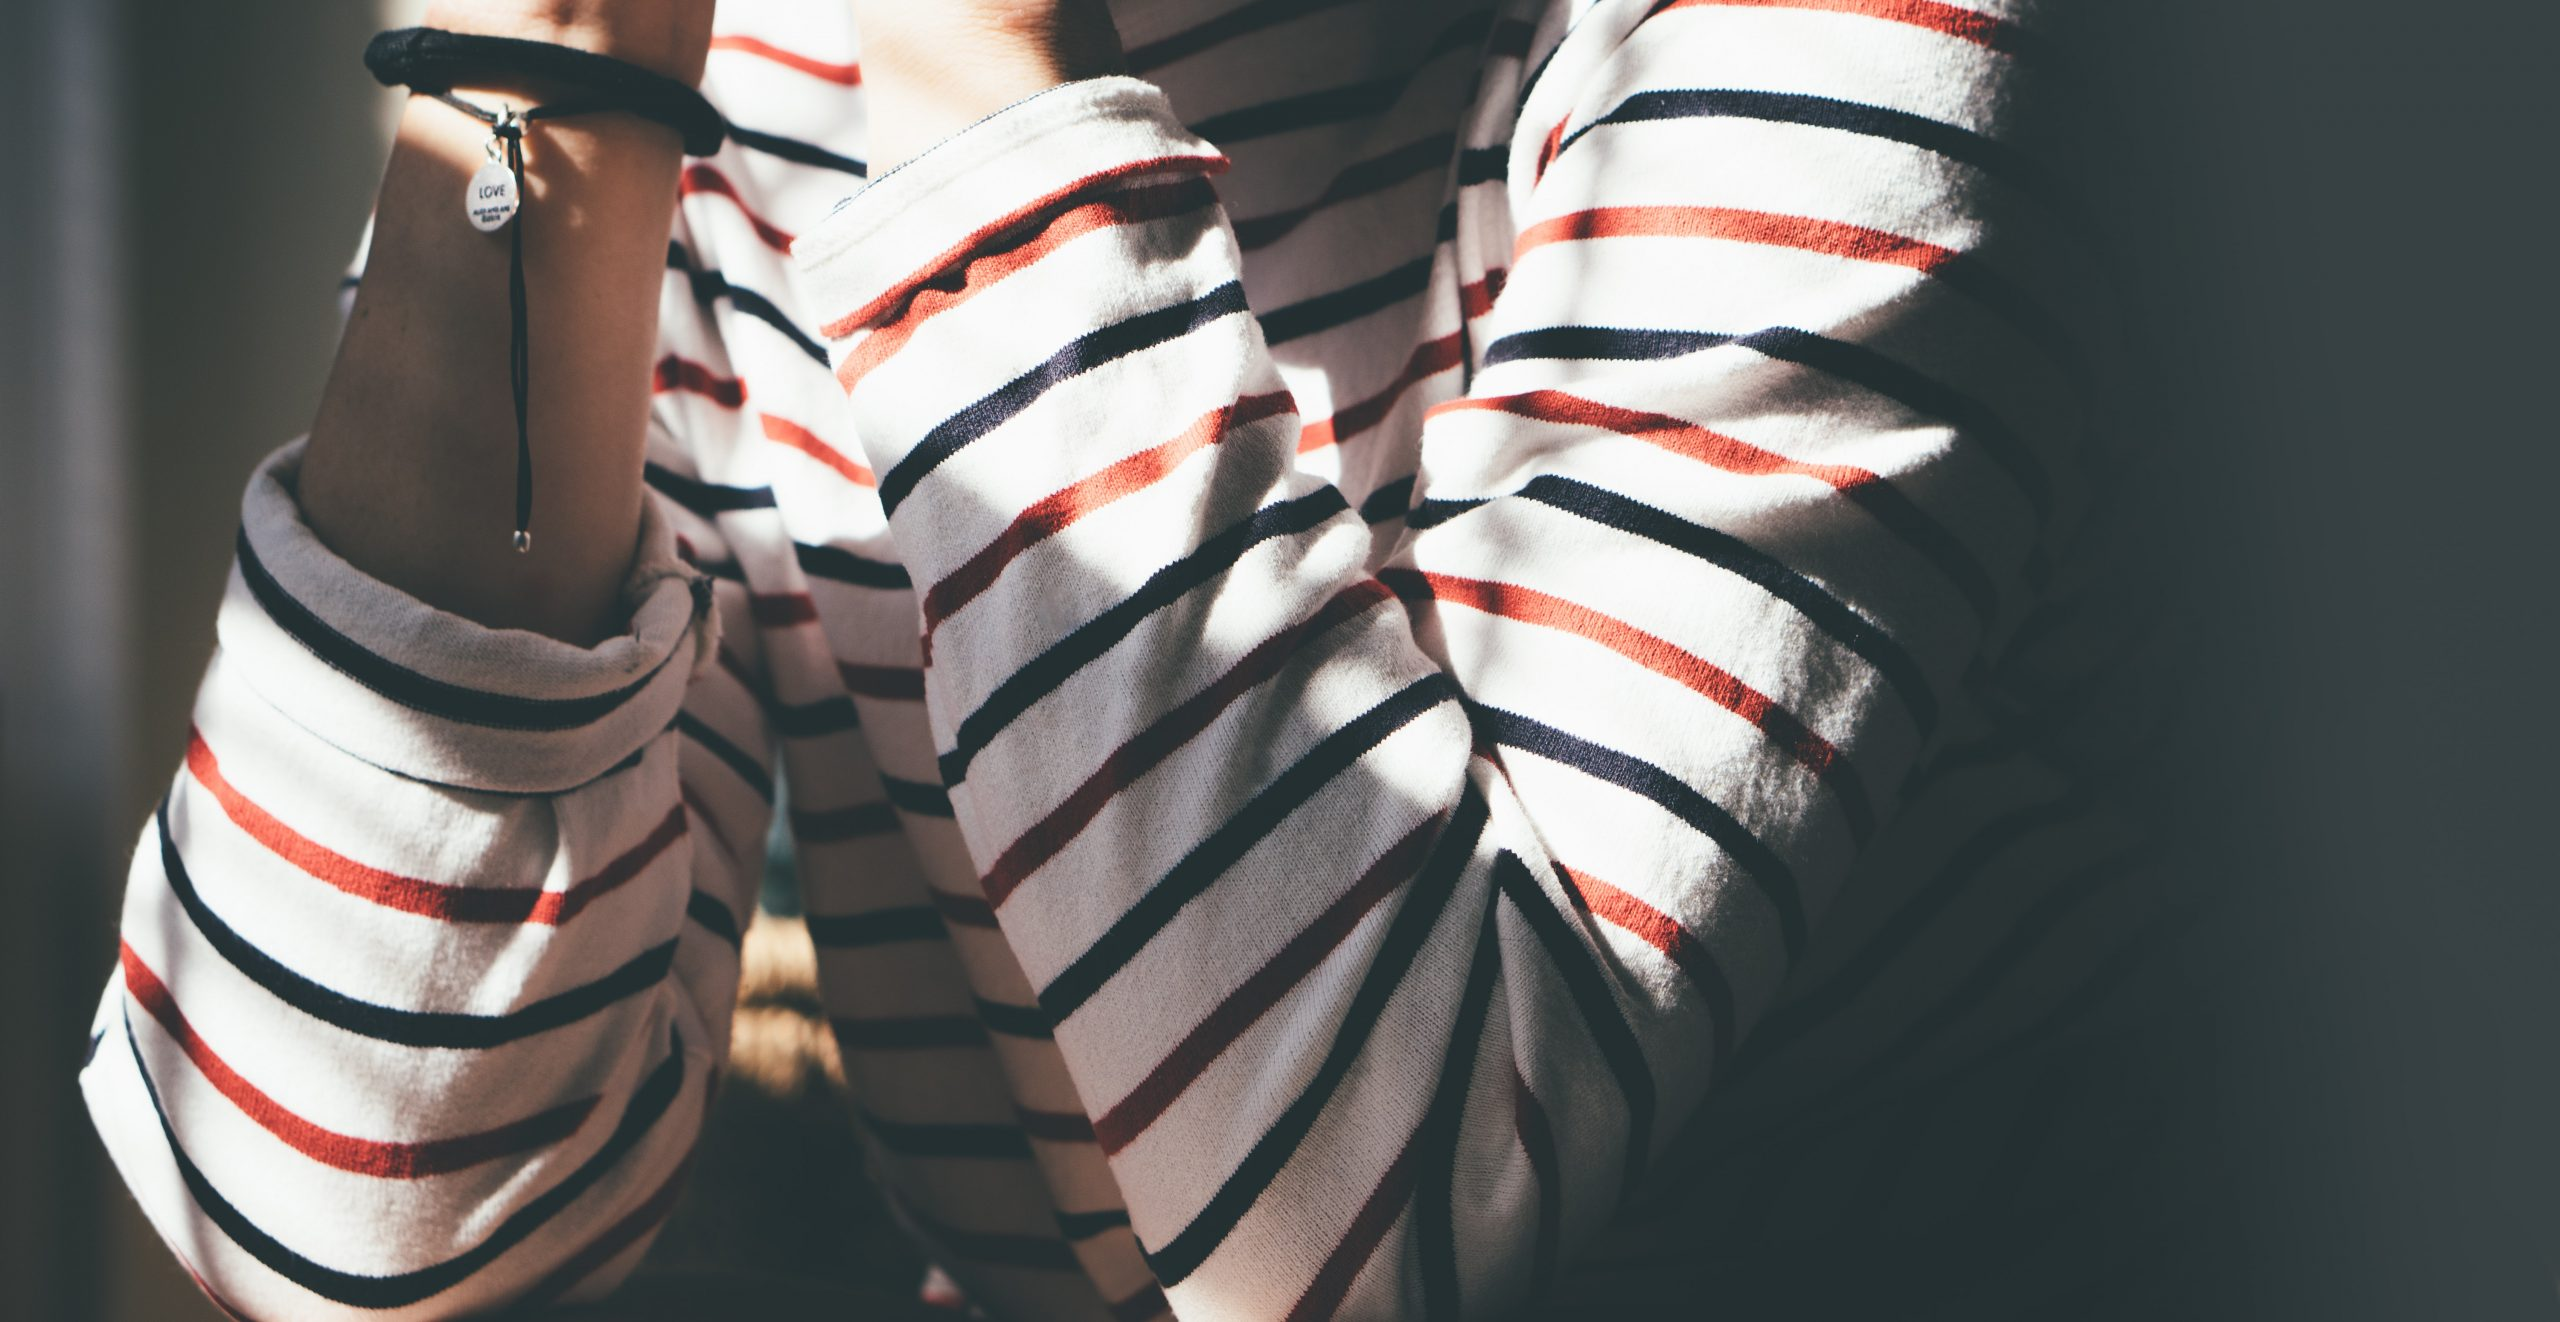 Where's Waldo? Improving Child Mental Health